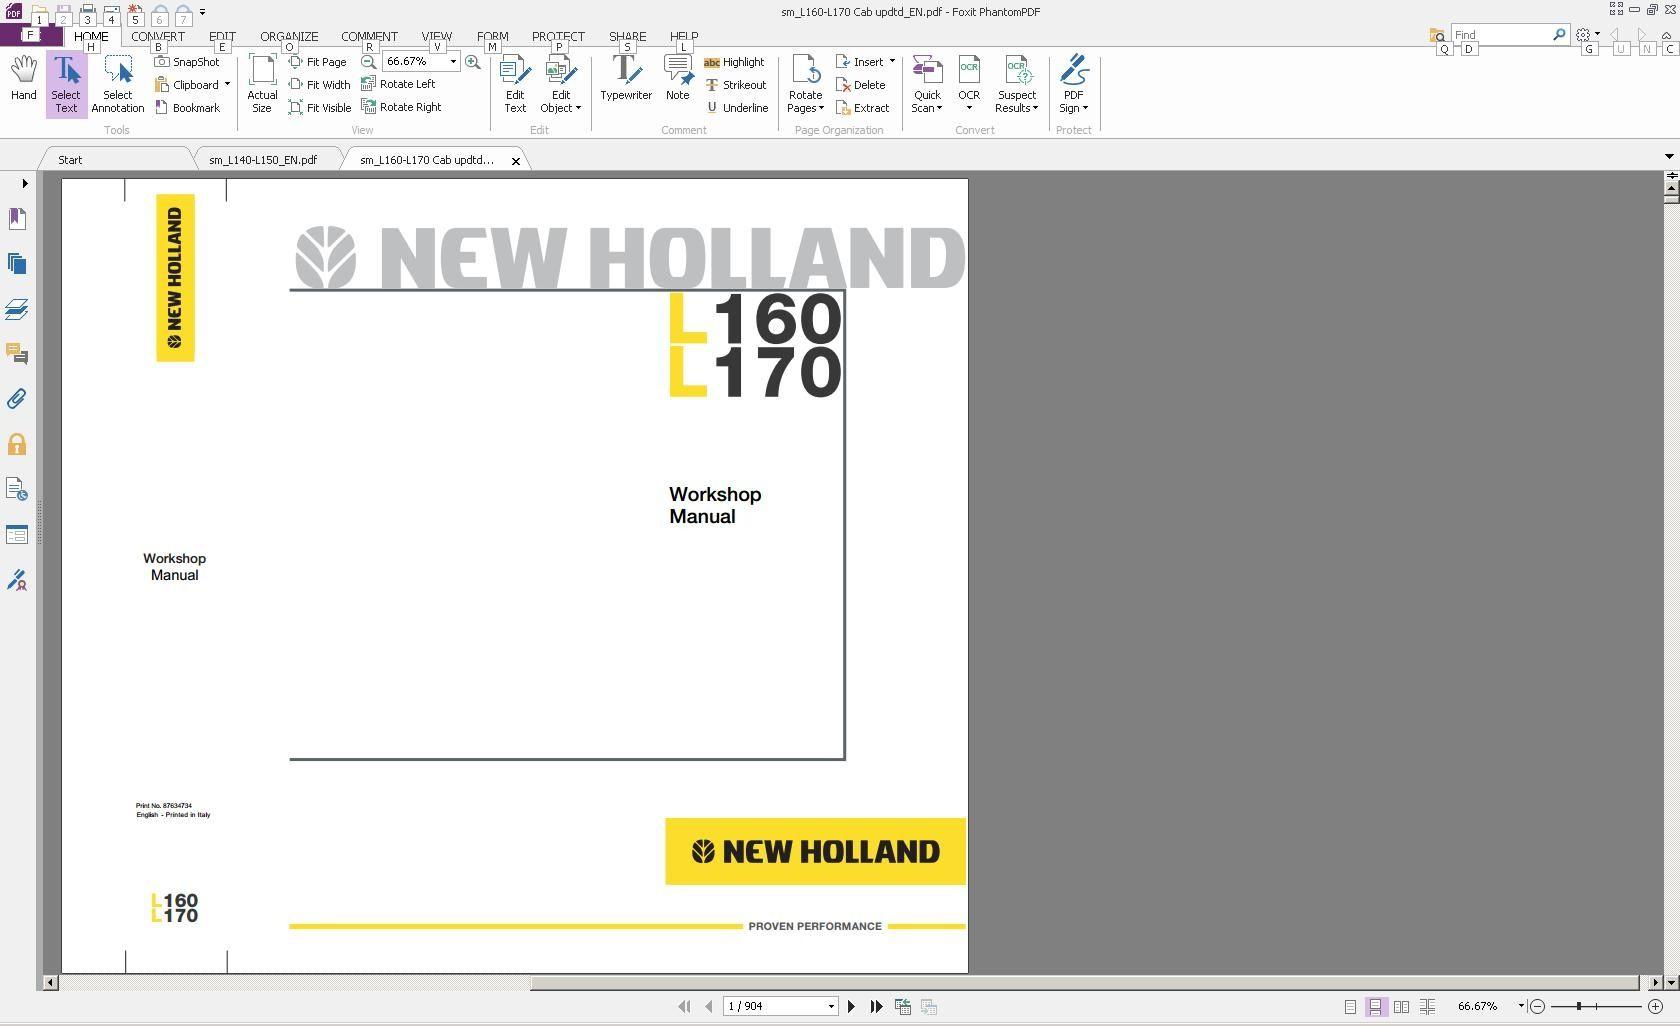 new holland ls190 wiring diagram new image wiring new holland skid steer loader l160 l170 workshop service manual on new holland ls190 wiring diagram